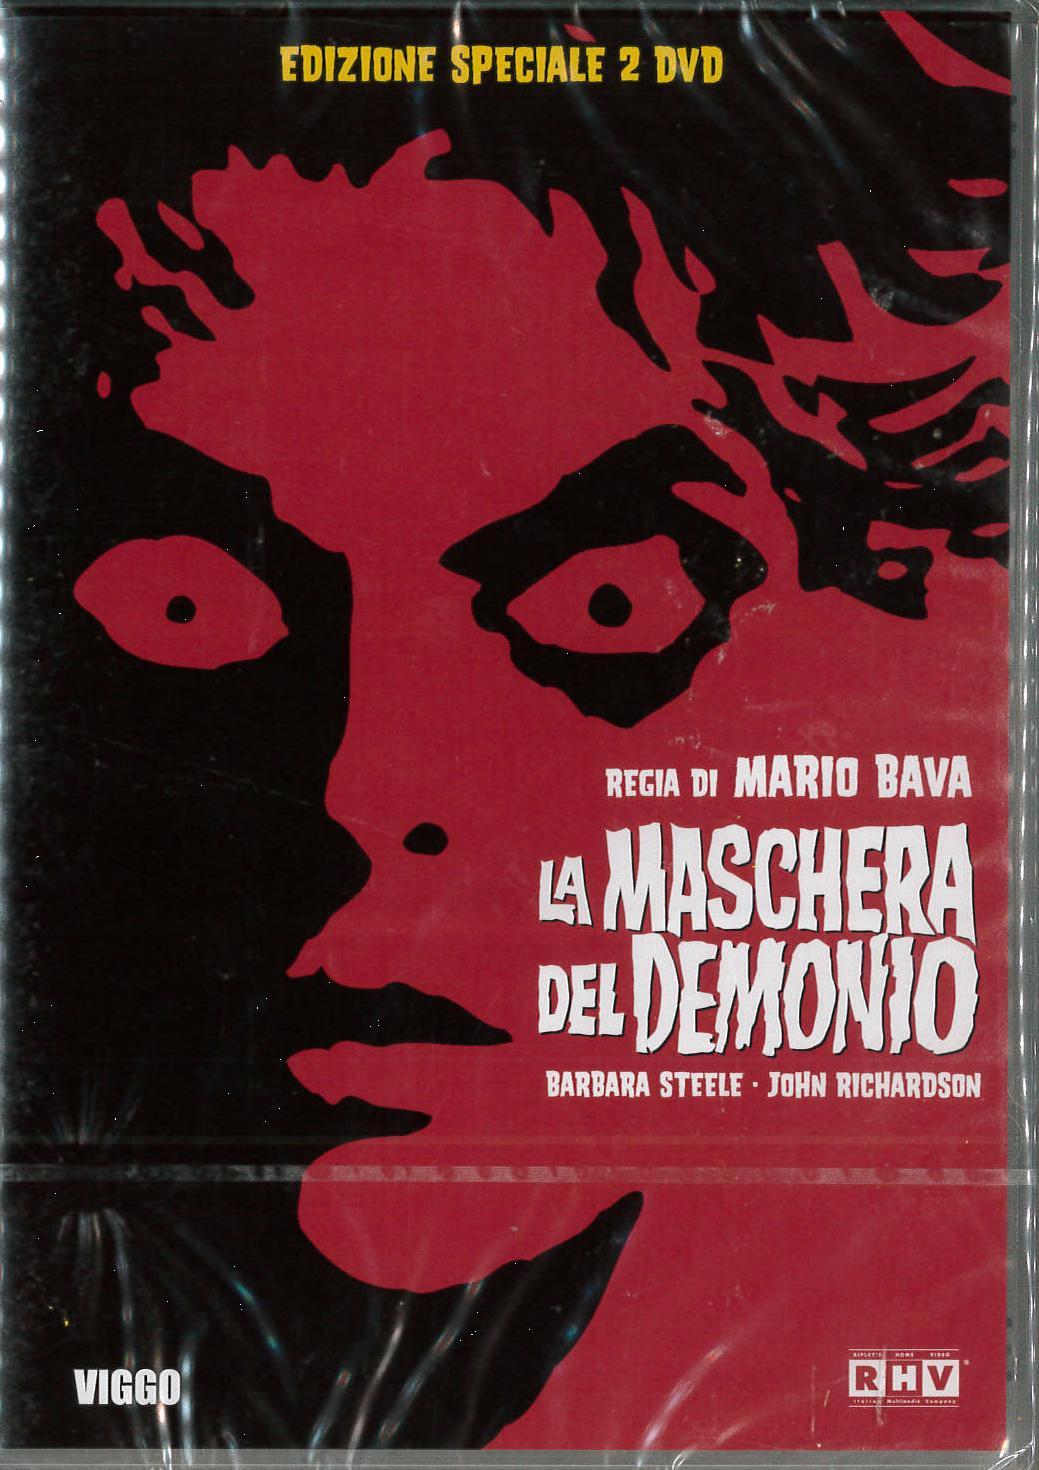 LA MASCHERA DEL DEMONIO (2 DVD) (DVD)